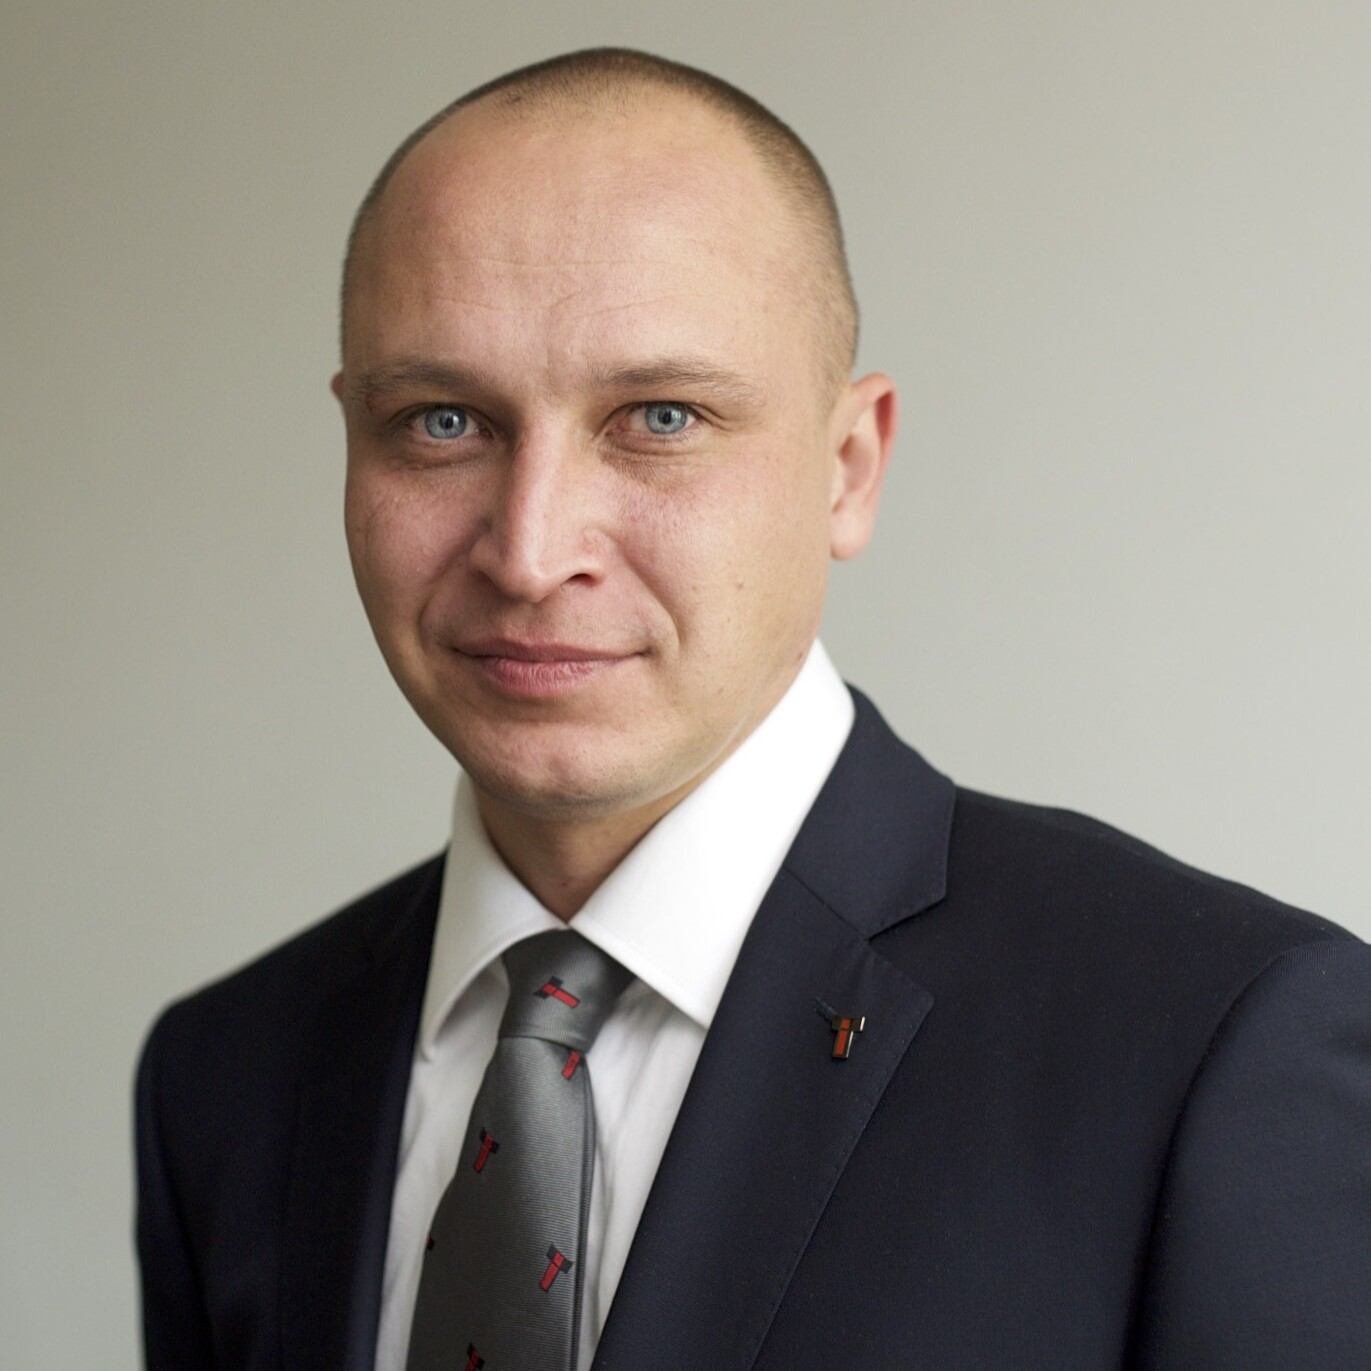 Георгий Фролов, Innovative Technology sq